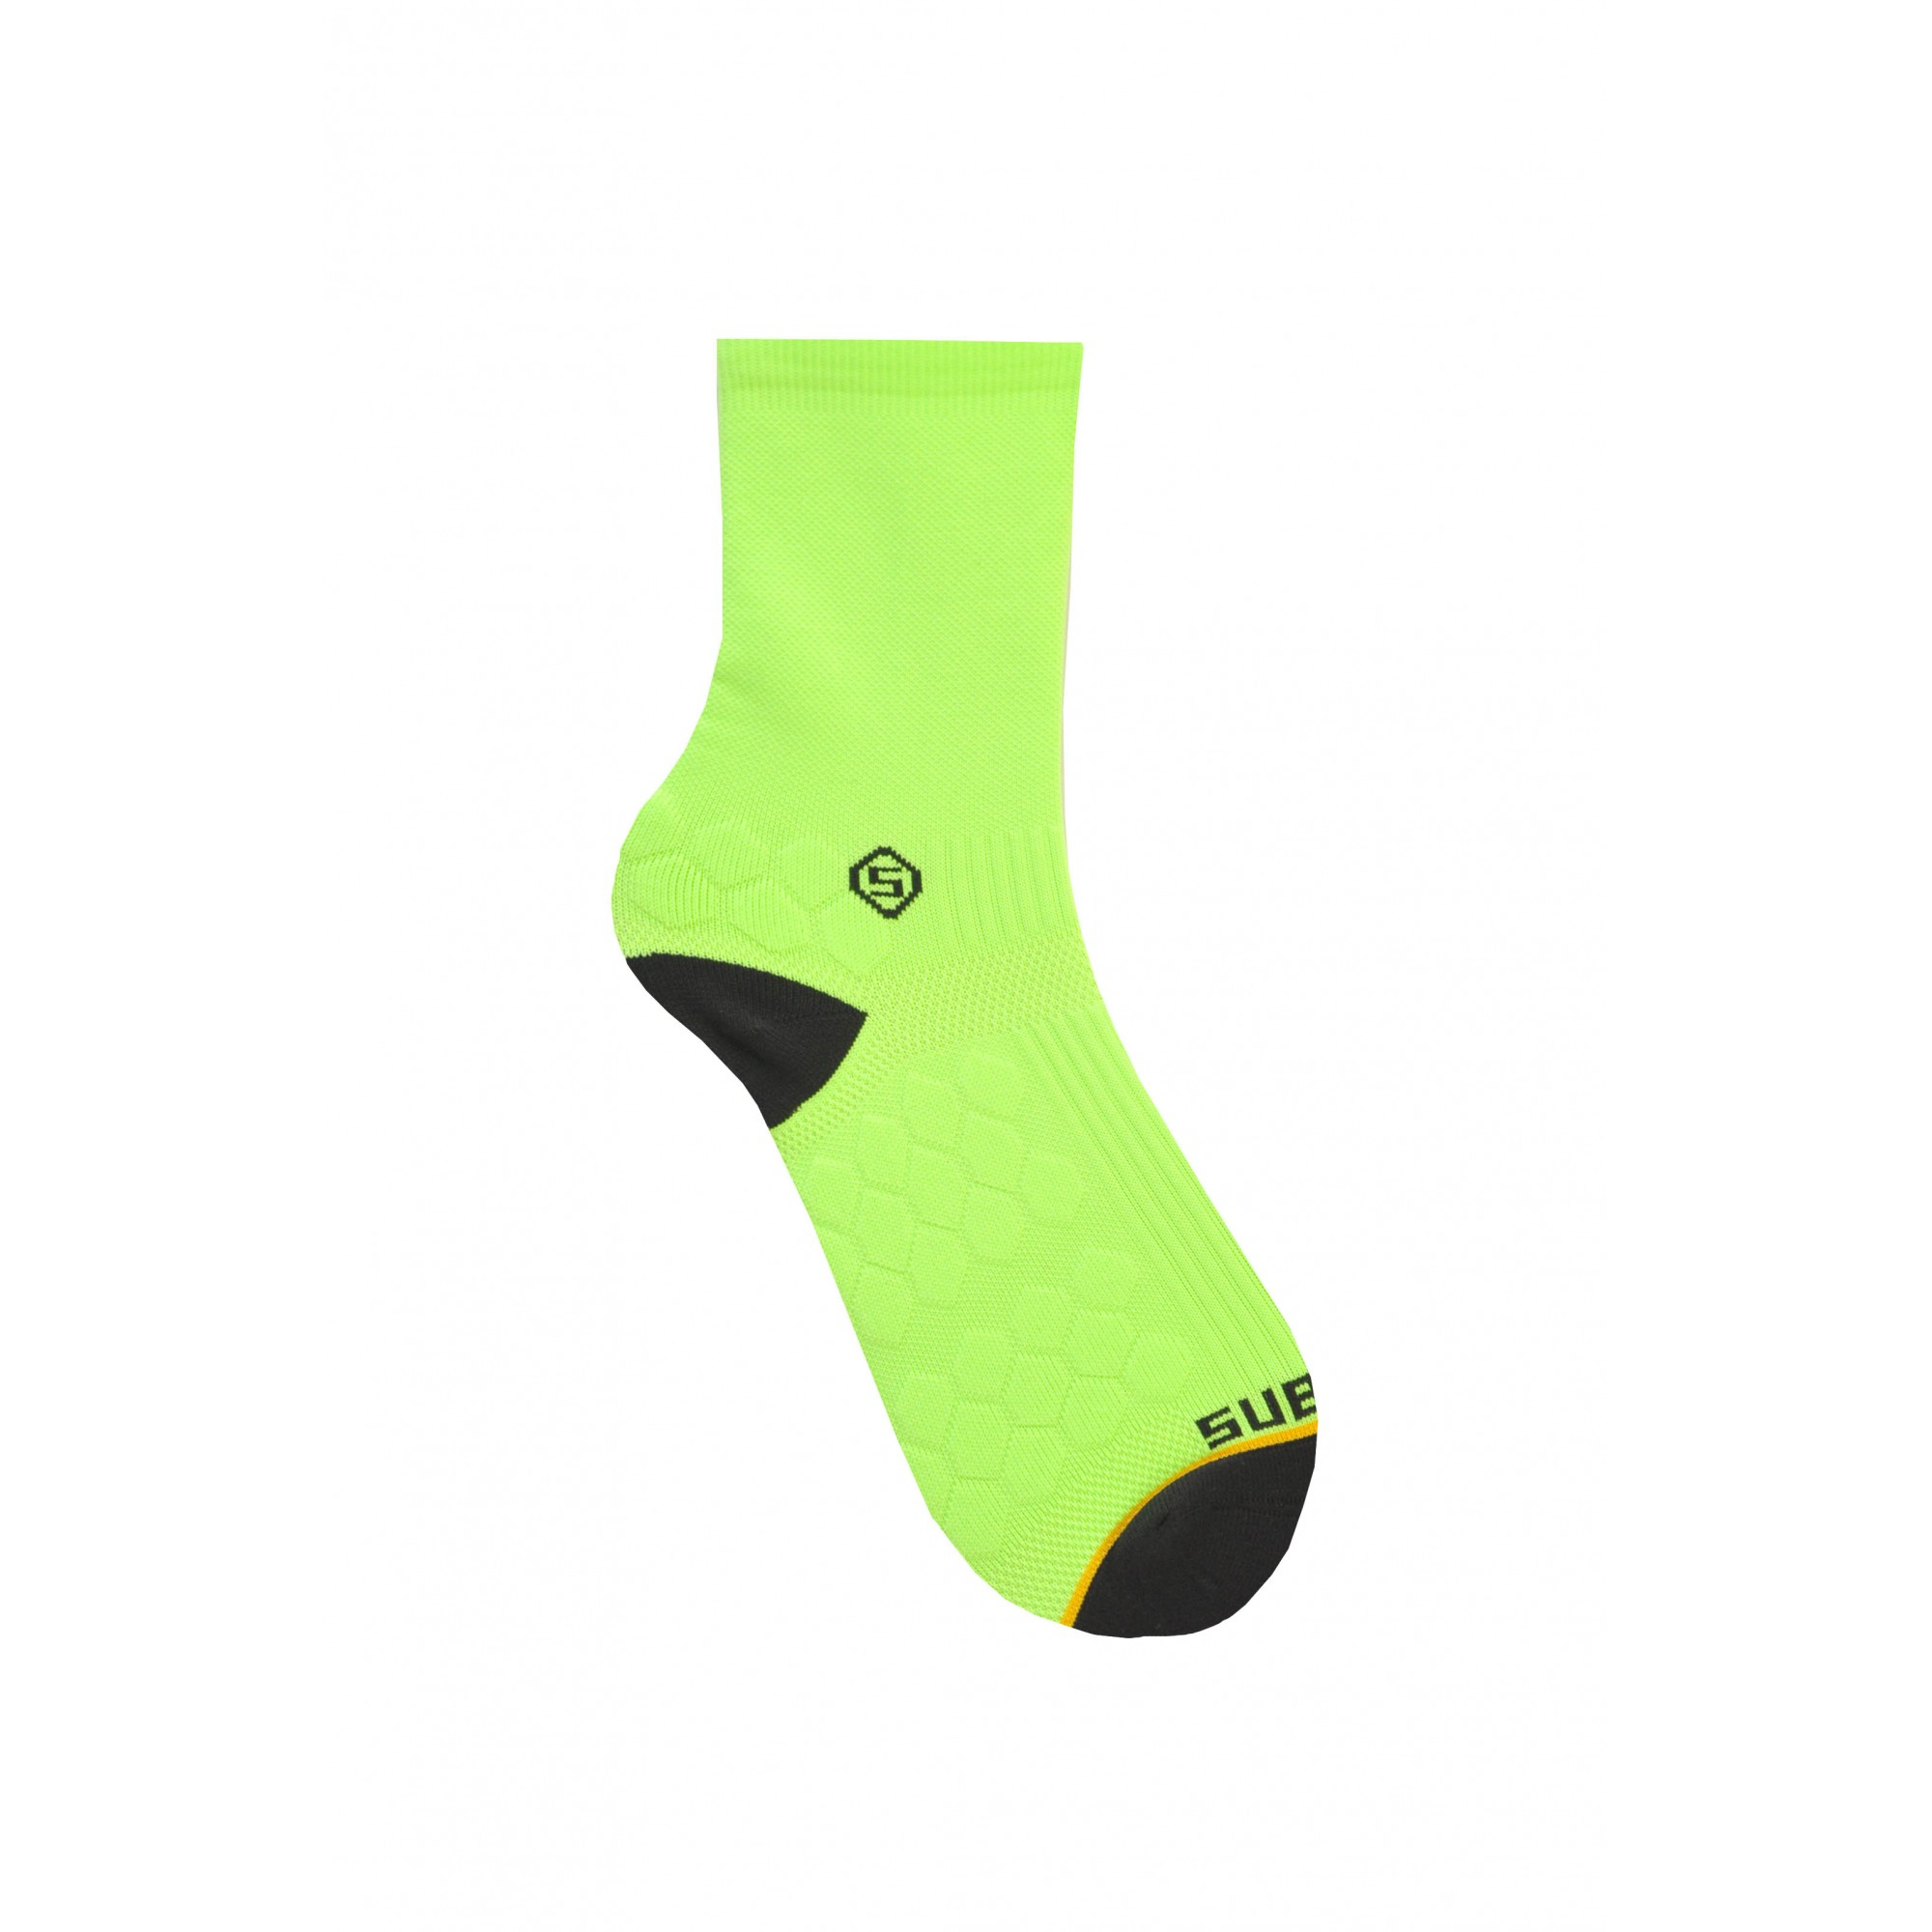 Meia Sublime TechSport 10 Verde Neon